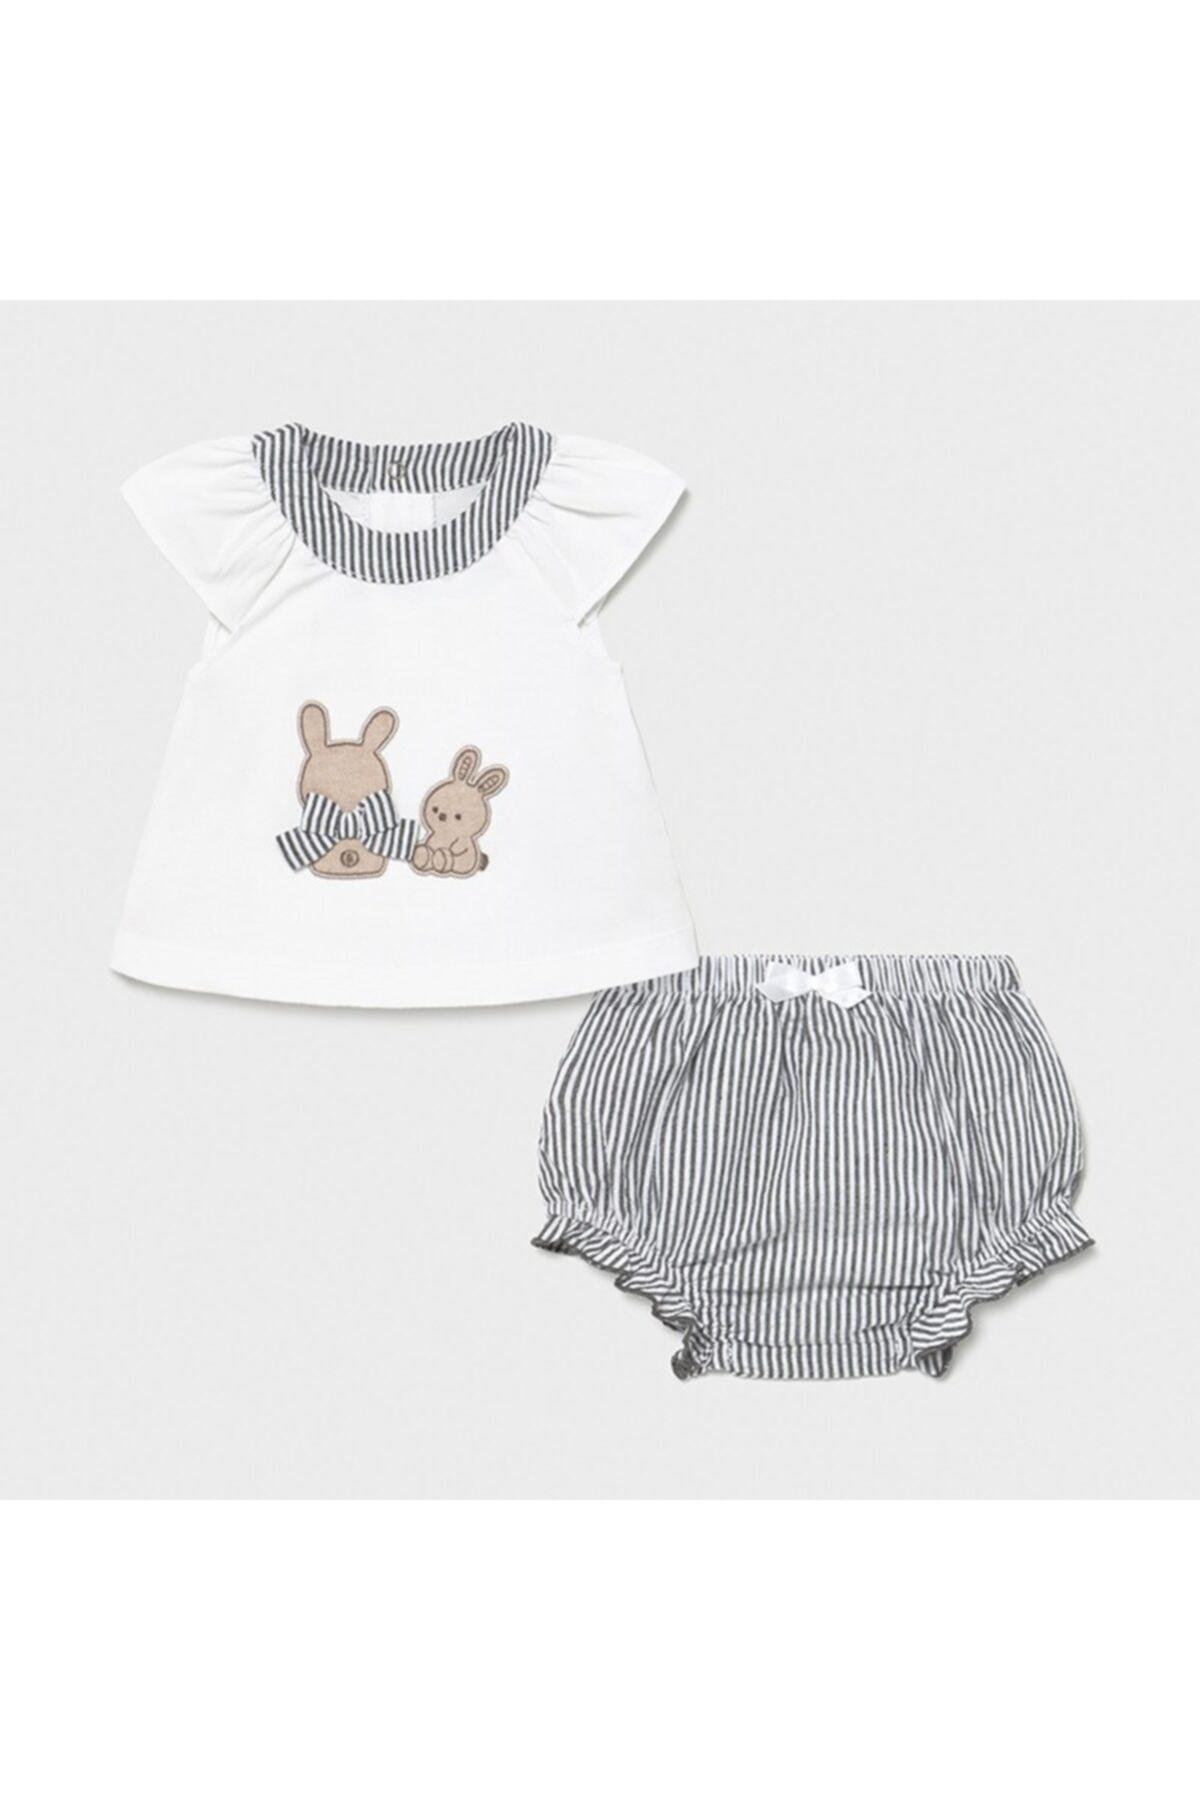 MAYORAL Kız Bebek Takım 2'li 1